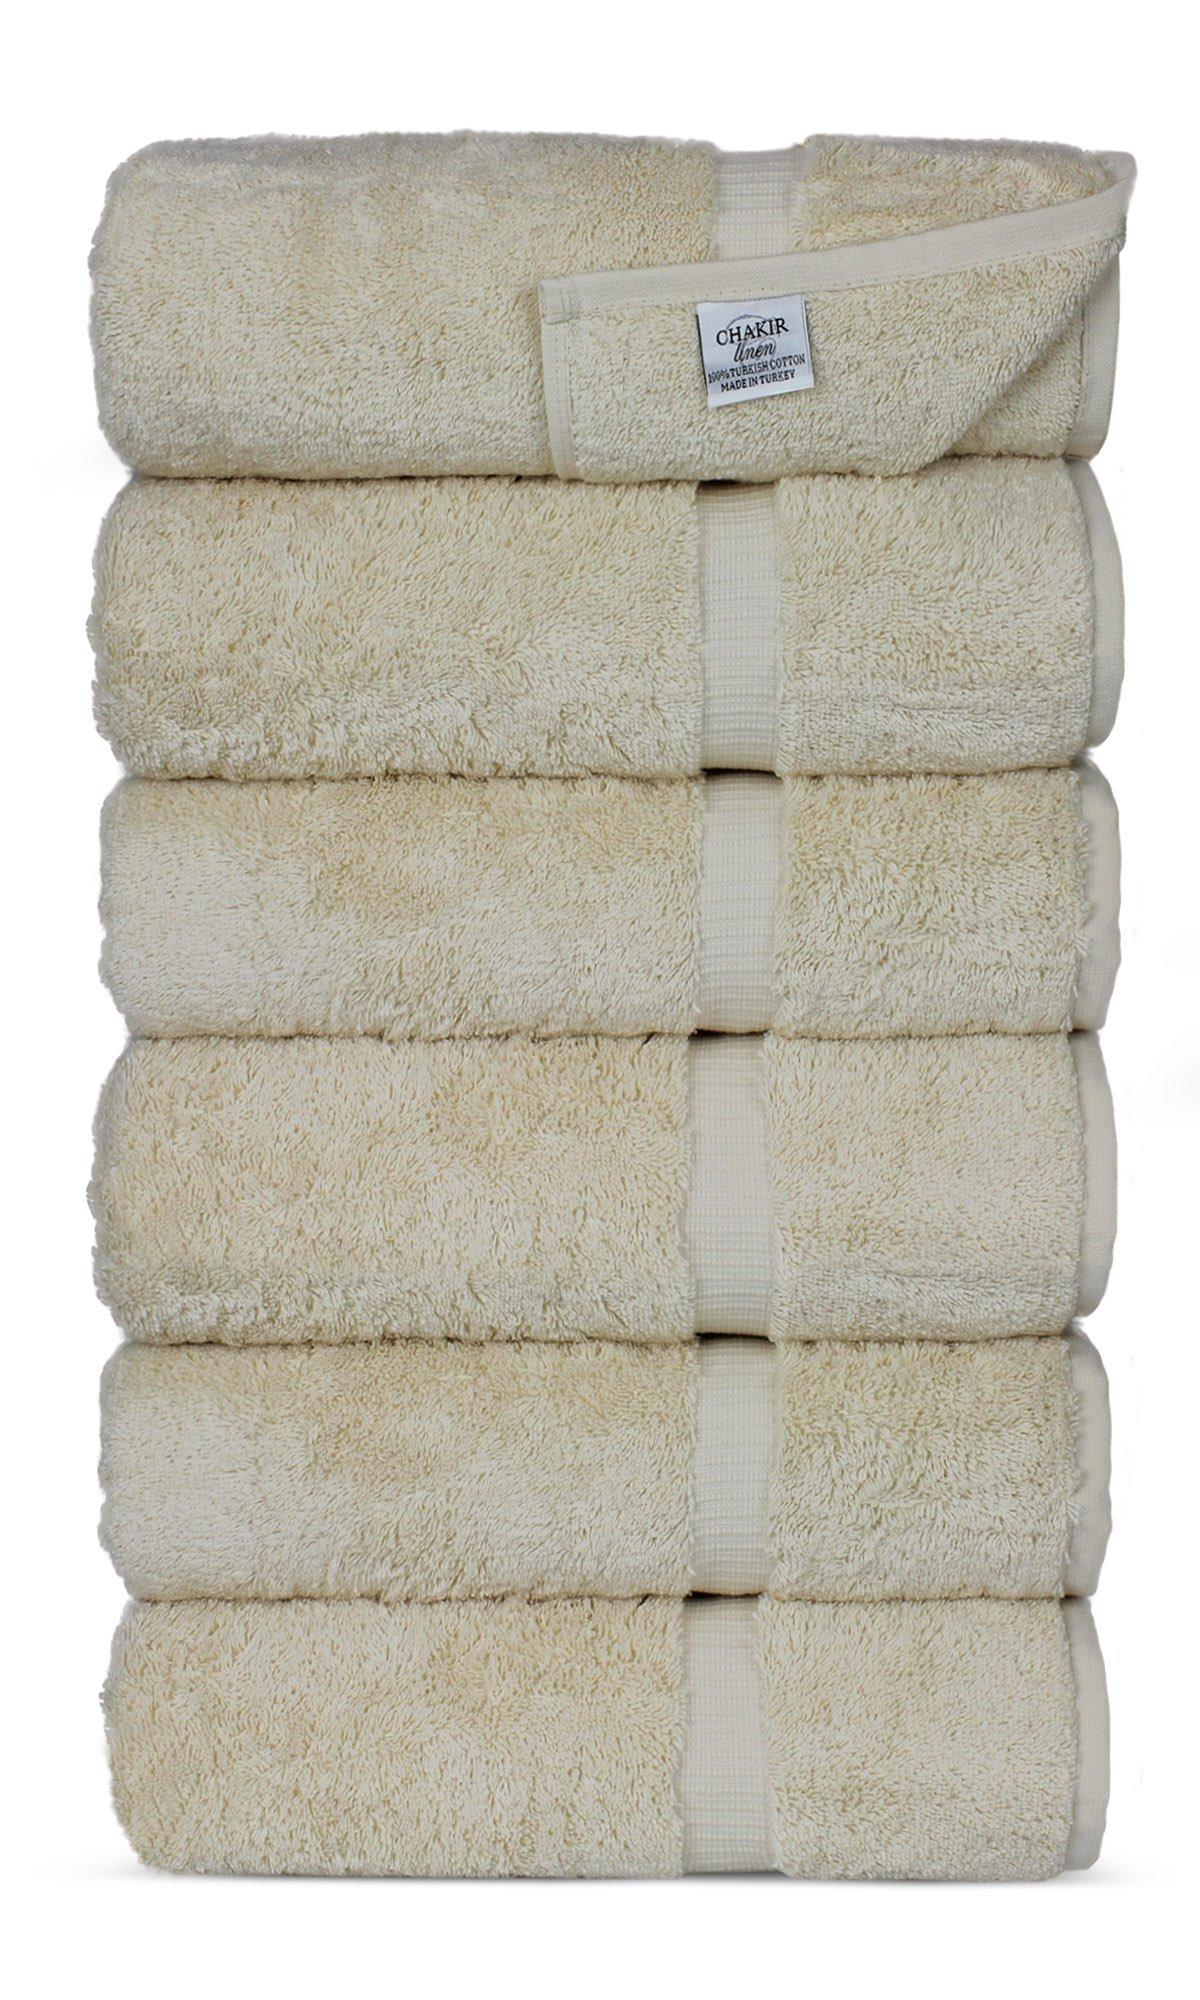 Luxury Premium long-stable Hotel & Spa Turkish Cotton 6-Piece Eco-Friendly Hand Towel Set (Beige)